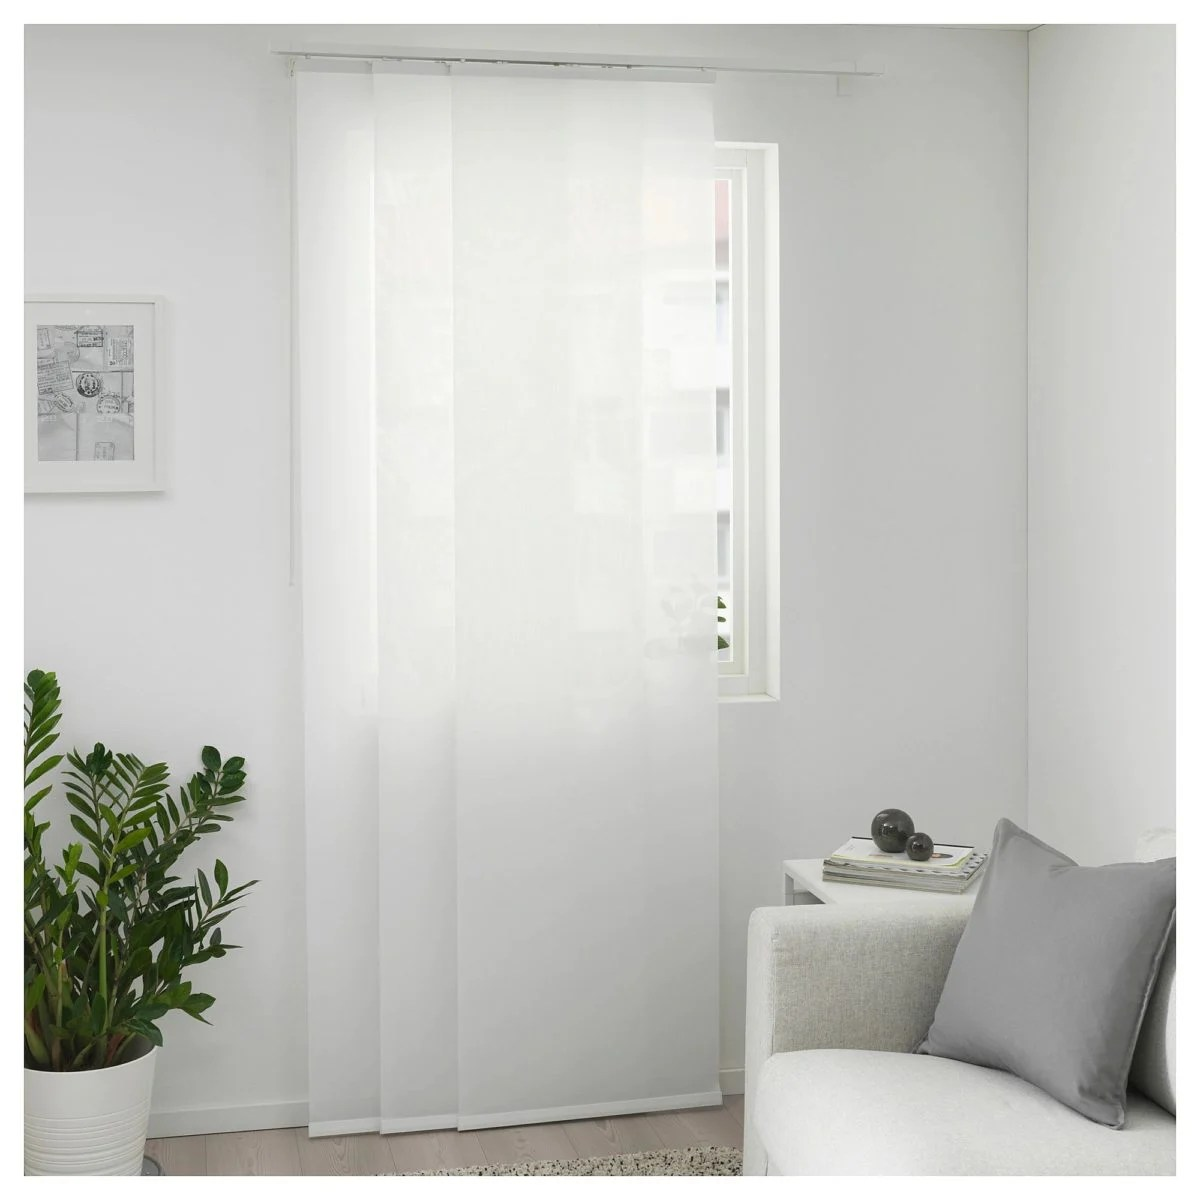 Tende a pannello ikea in vendita in arredamento e casalinghi: Ikea Tende 2021